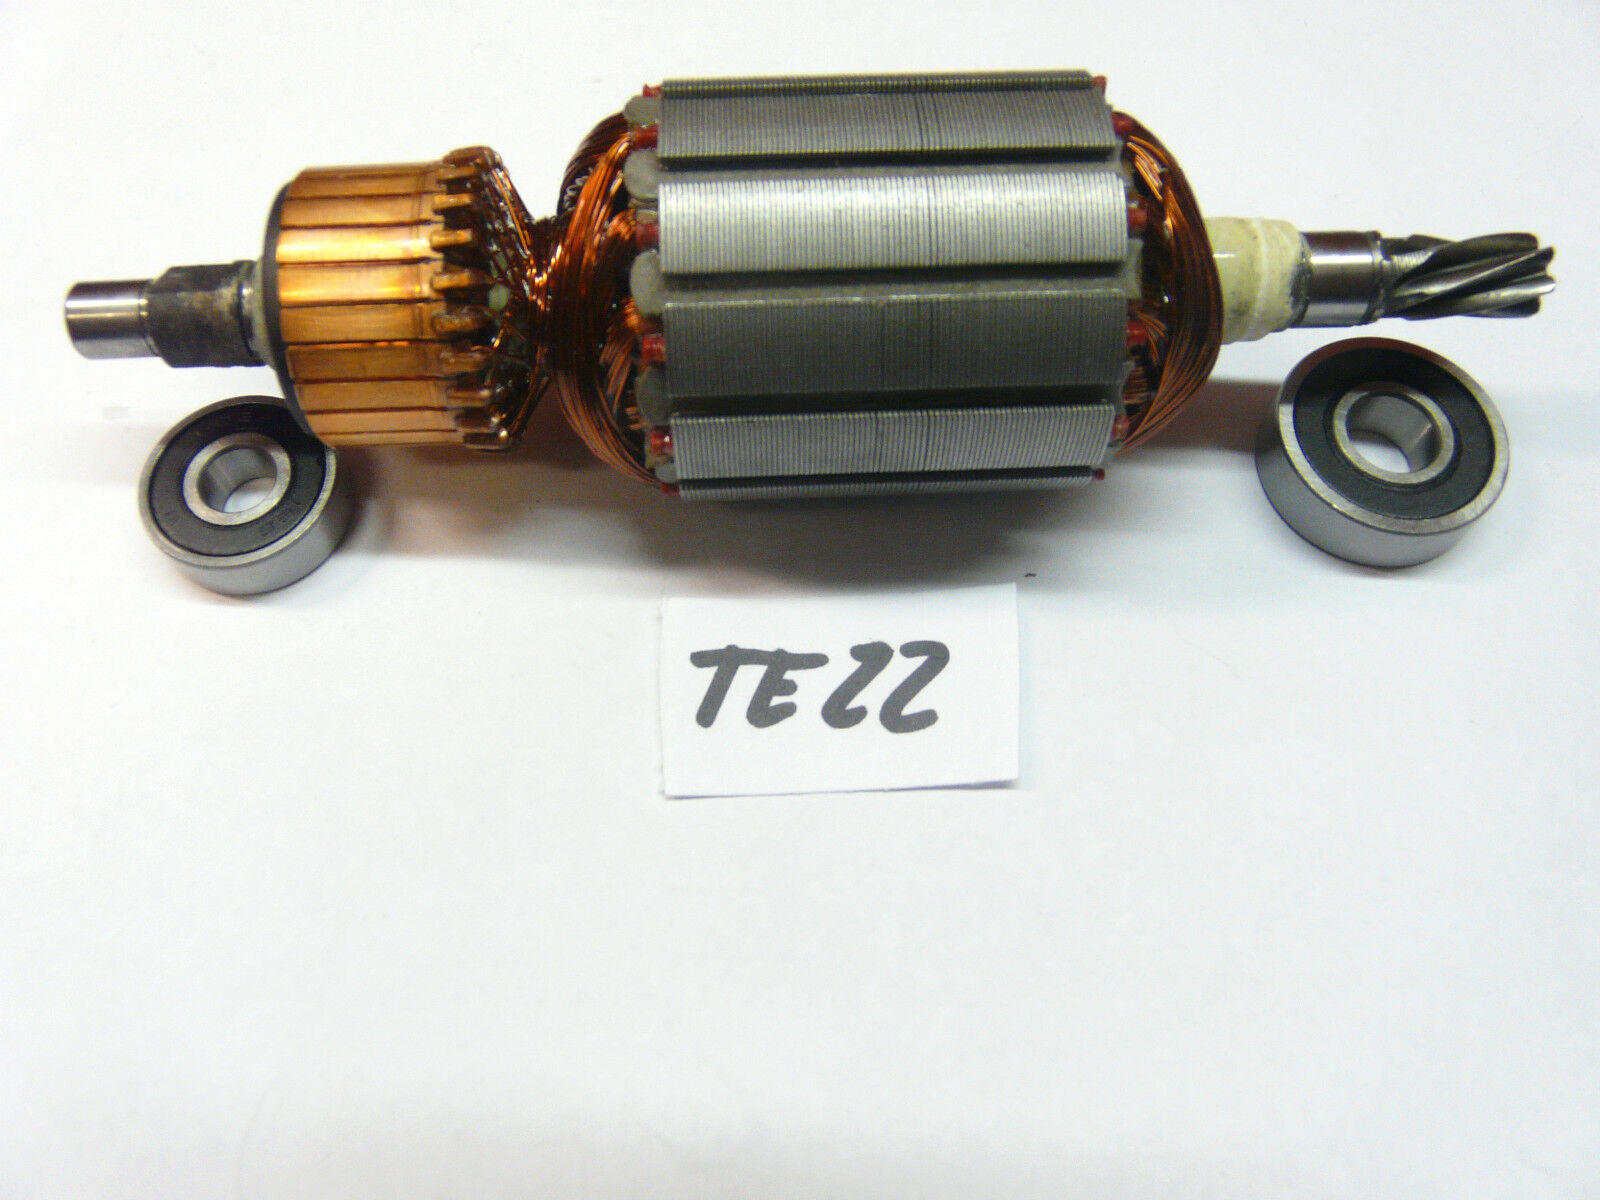 Hilti TE 22 Rotor, Anker + beide Lagern vom Rotor